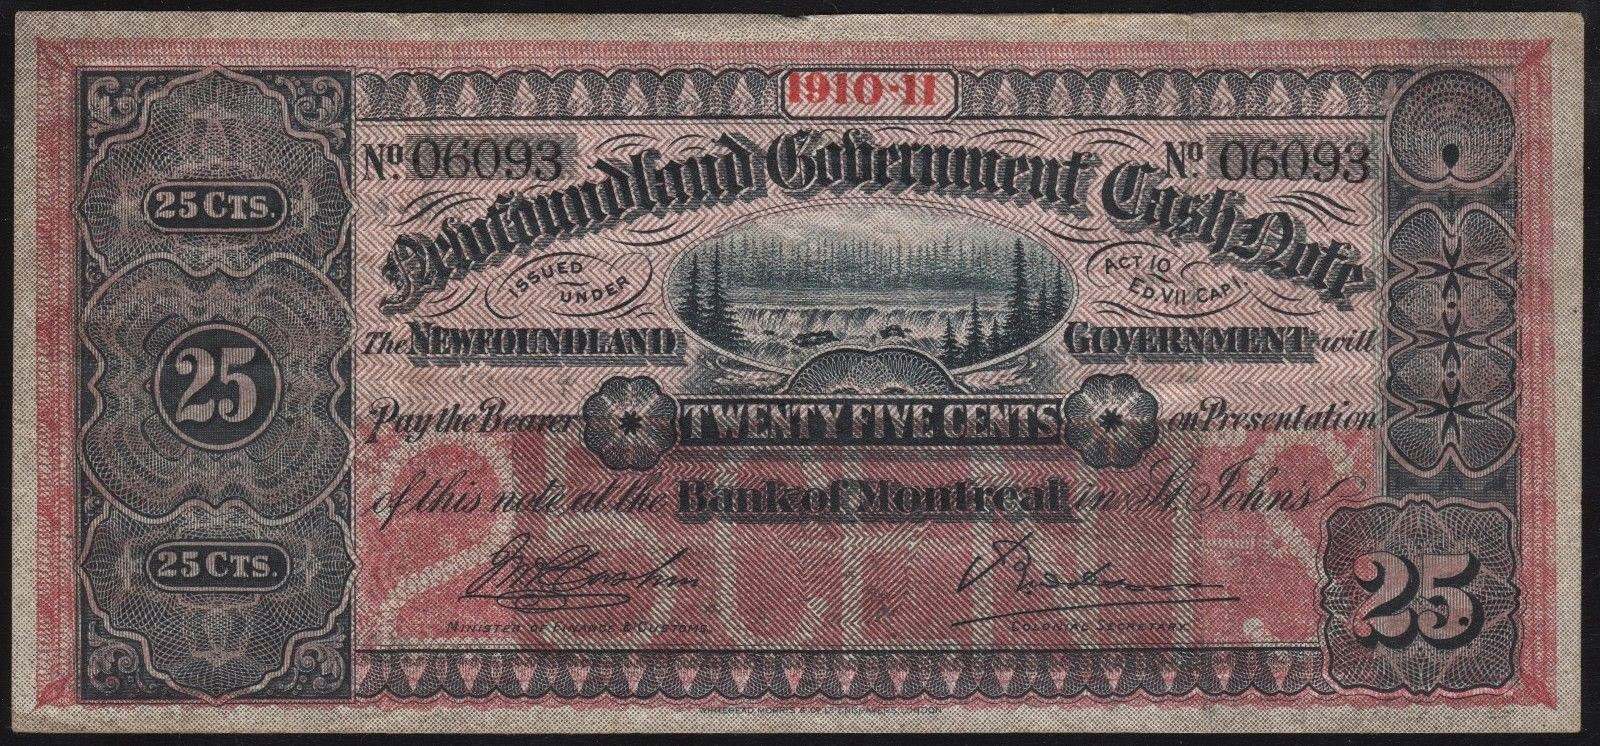 Newfoundland Government Cash Note 25 Cents